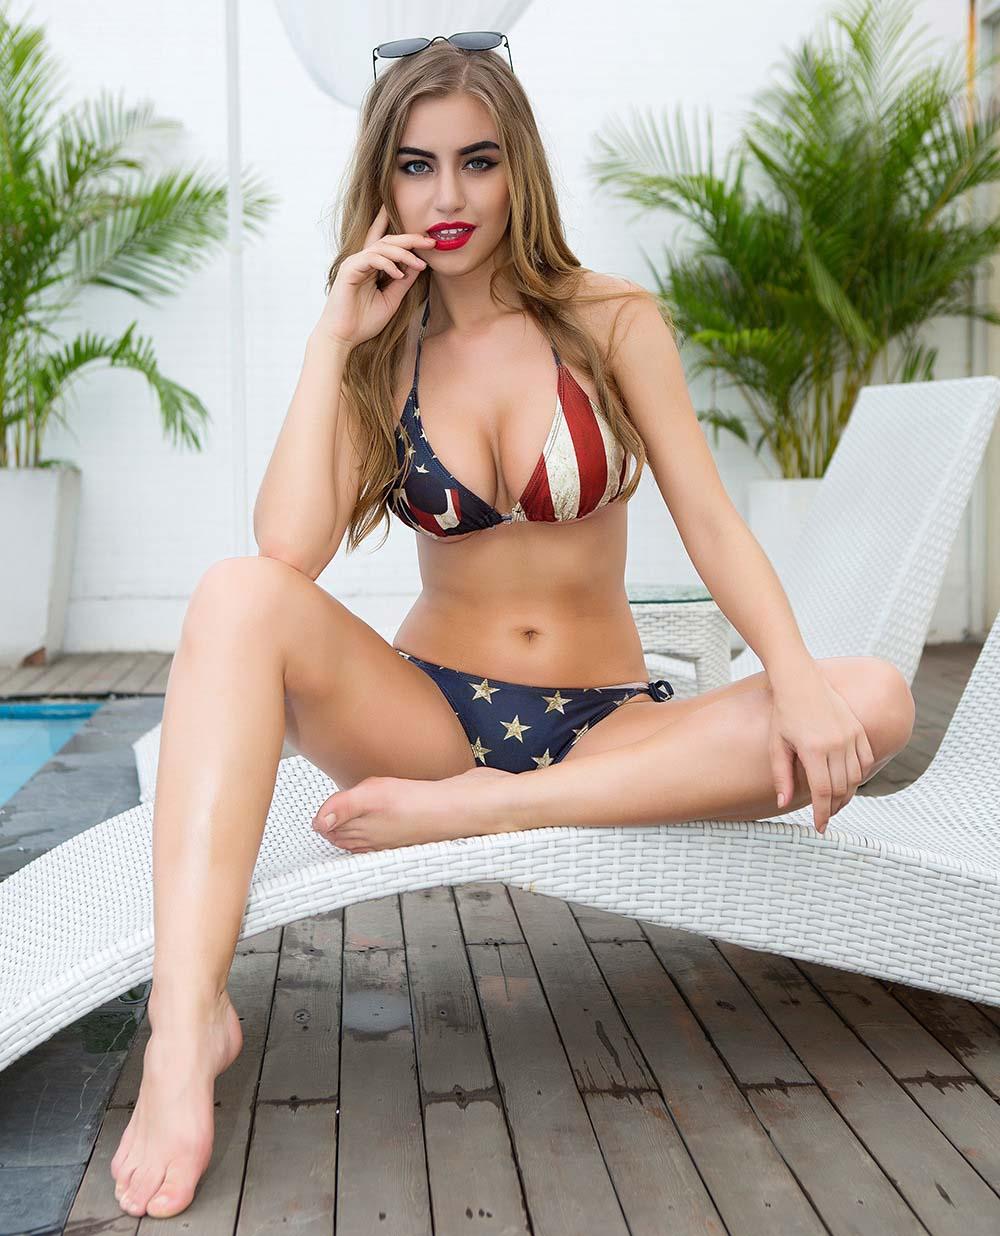 2018 sexy american flag bikini beach swimwear bkini swimsuit retro style for womens hot from. Black Bedroom Furniture Sets. Home Design Ideas